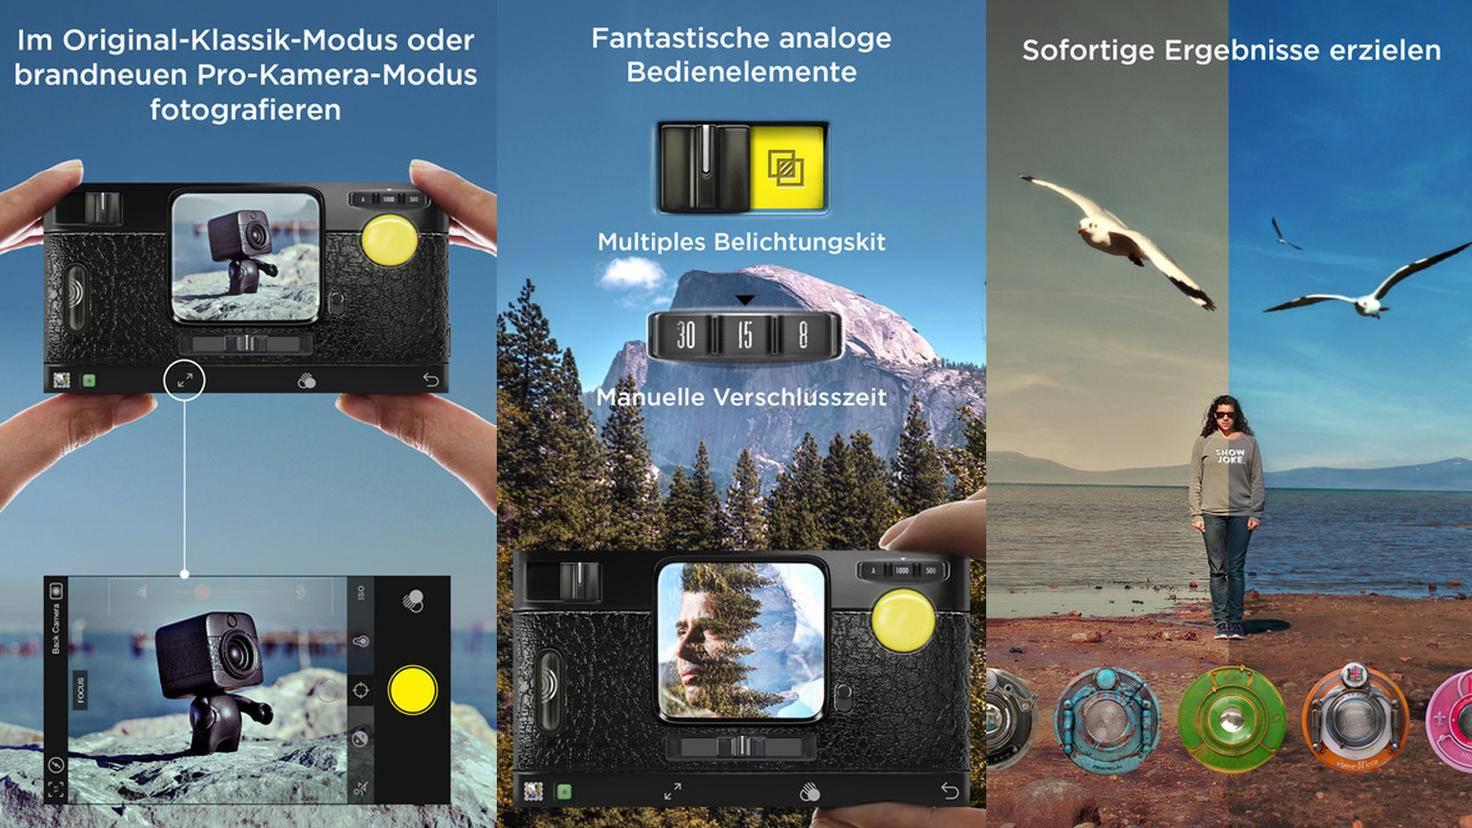 Smartphone-Fotos mit Retro-Flair: 6 Apps für den Vintage-Look